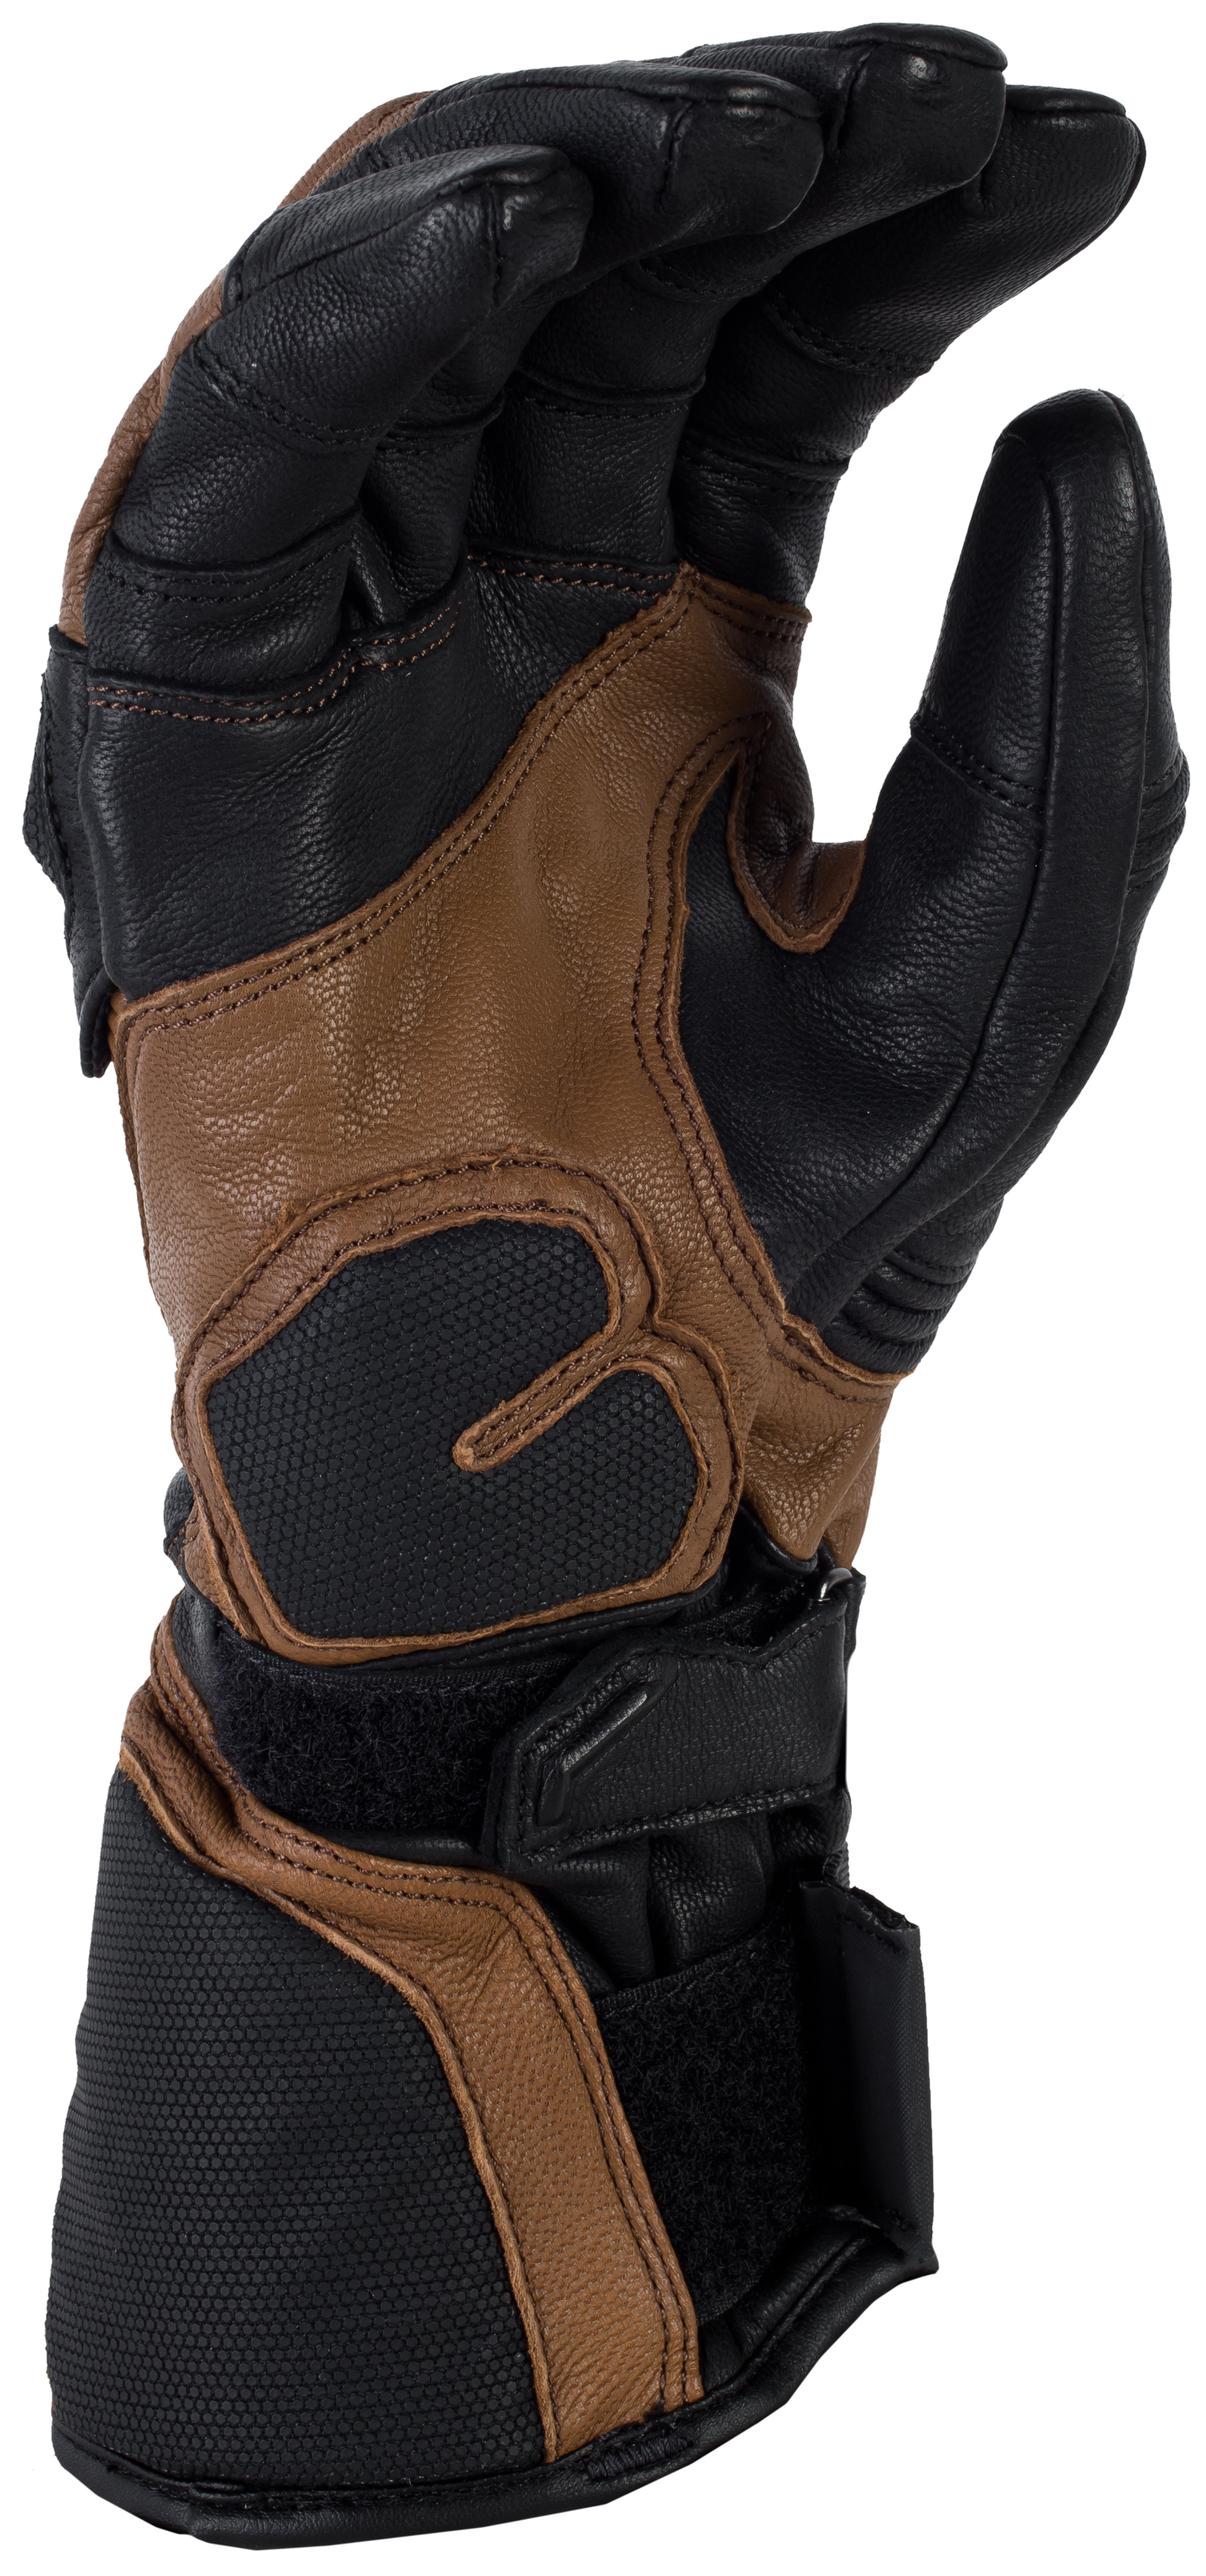 Adventure Glove Long 5032-001-900-B